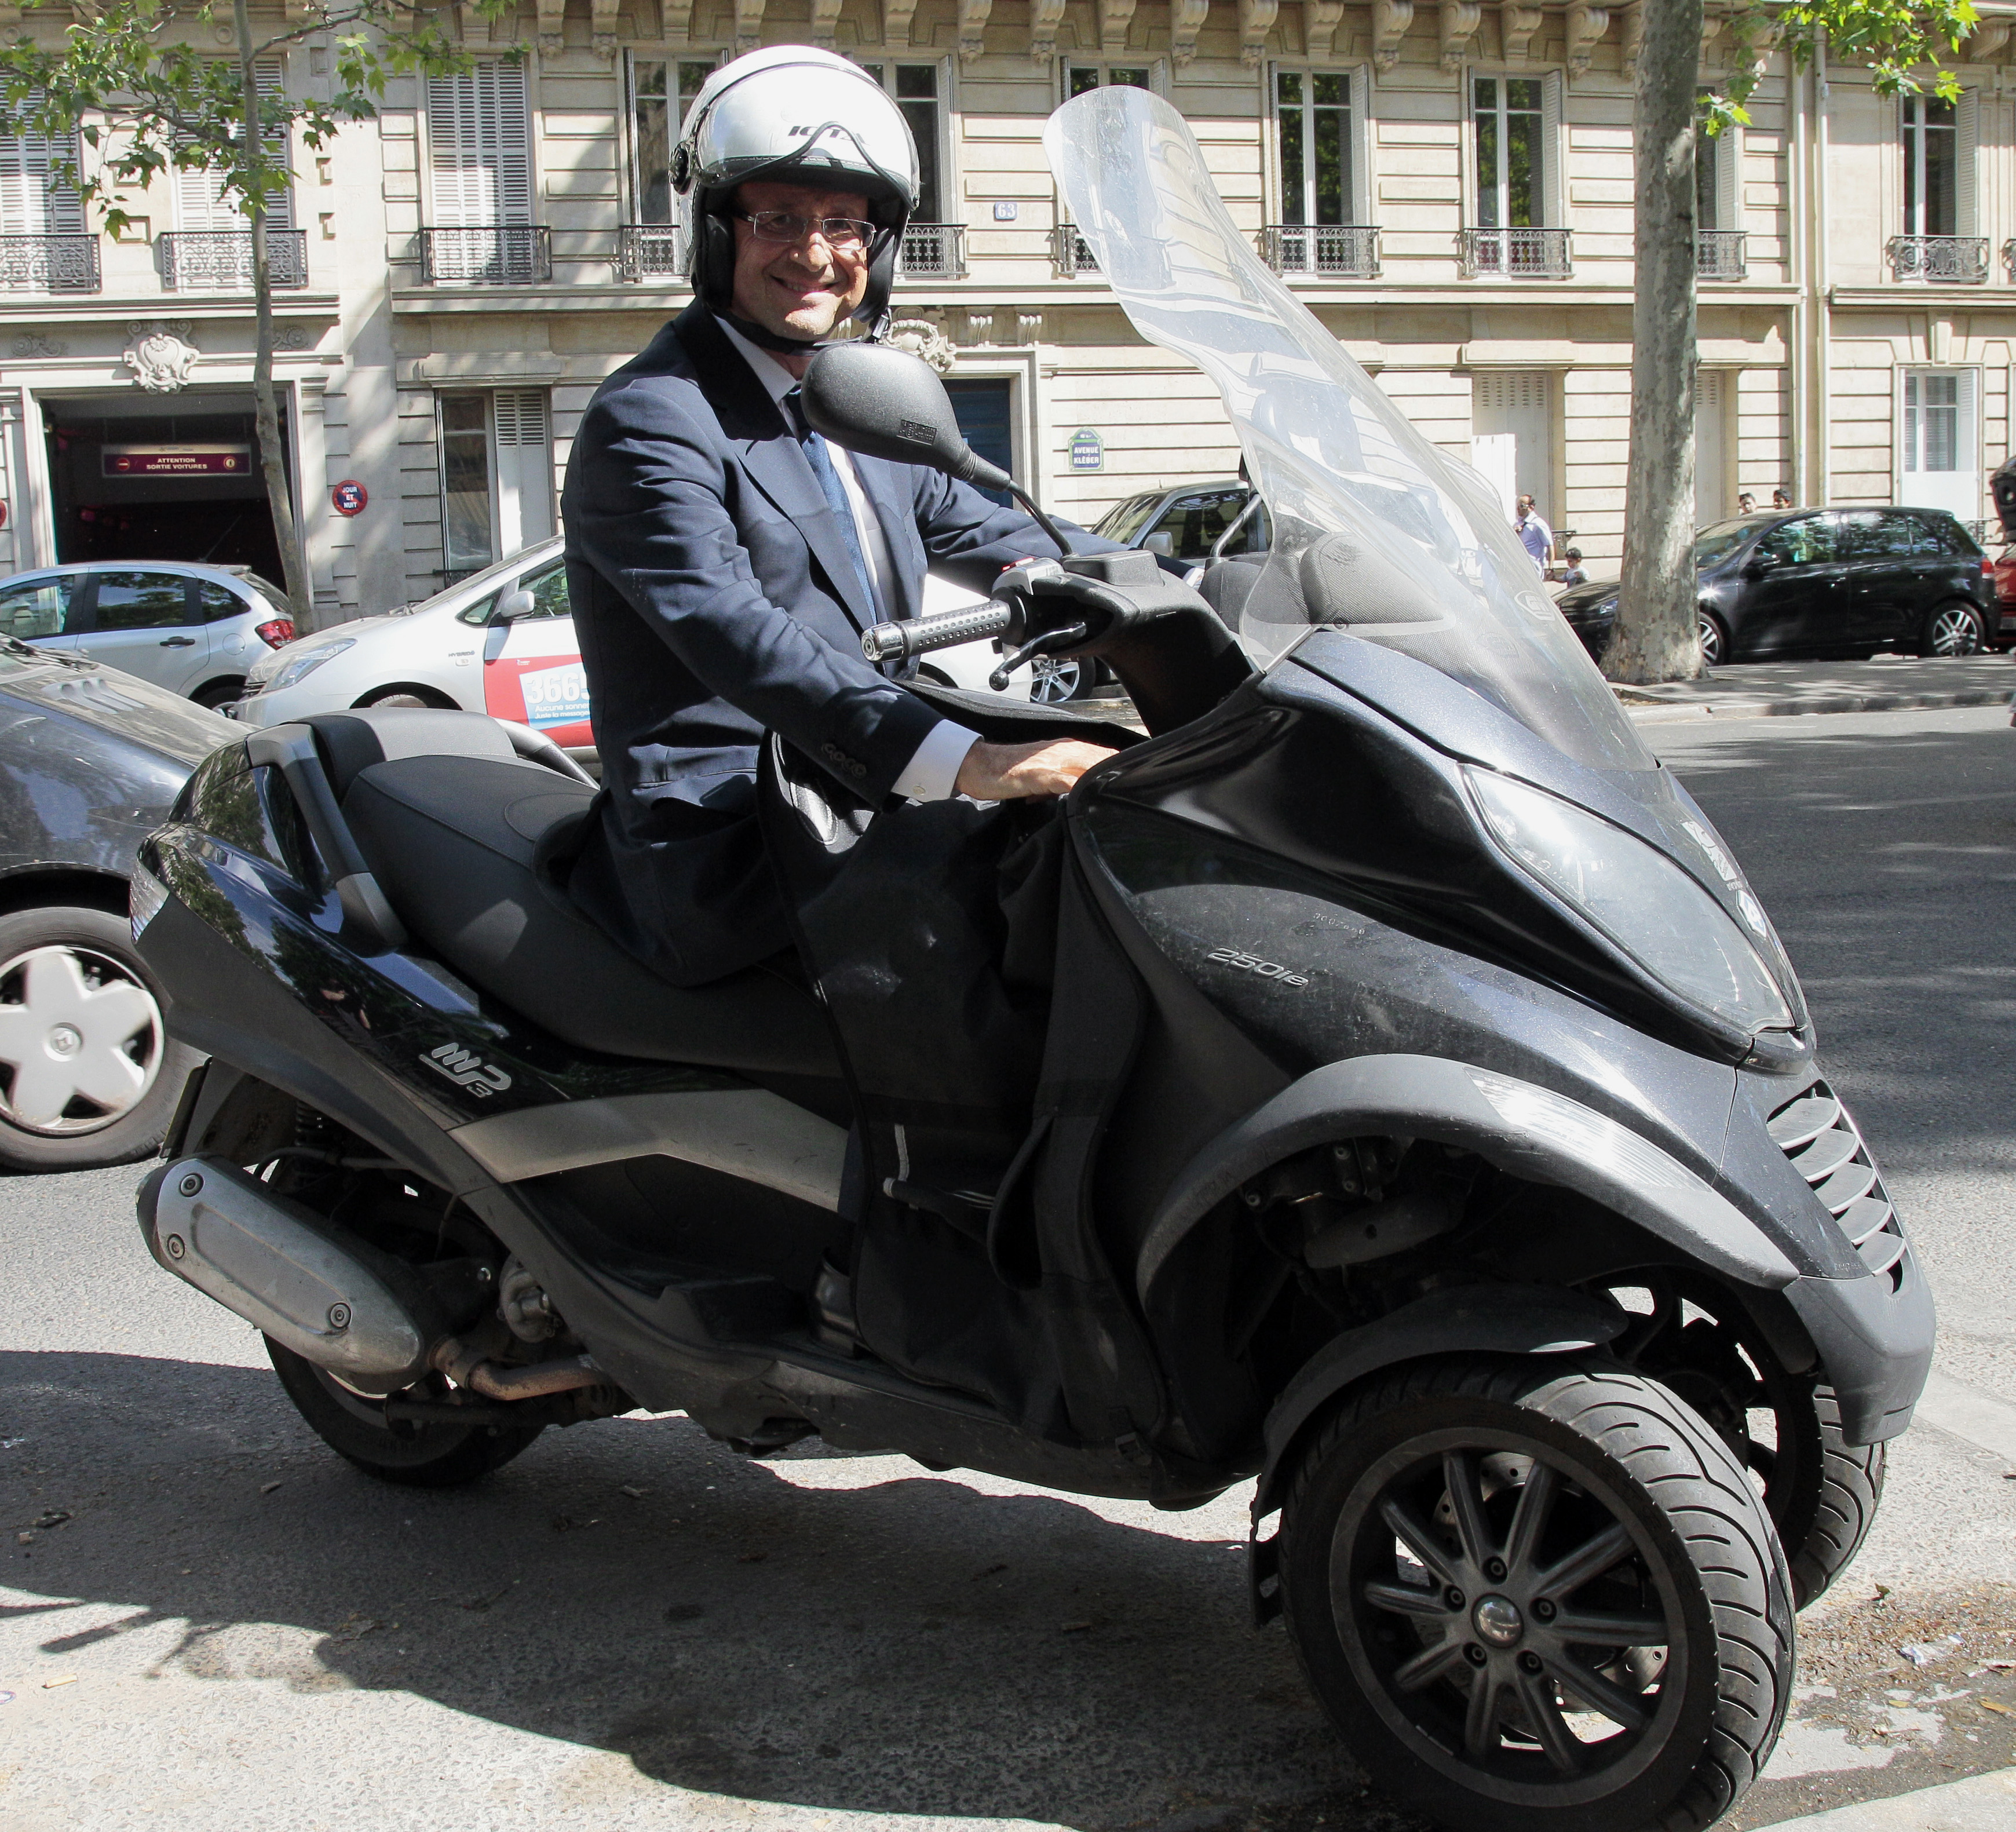 Jacques Chirac très affaibli d'après Patrick Sébastien